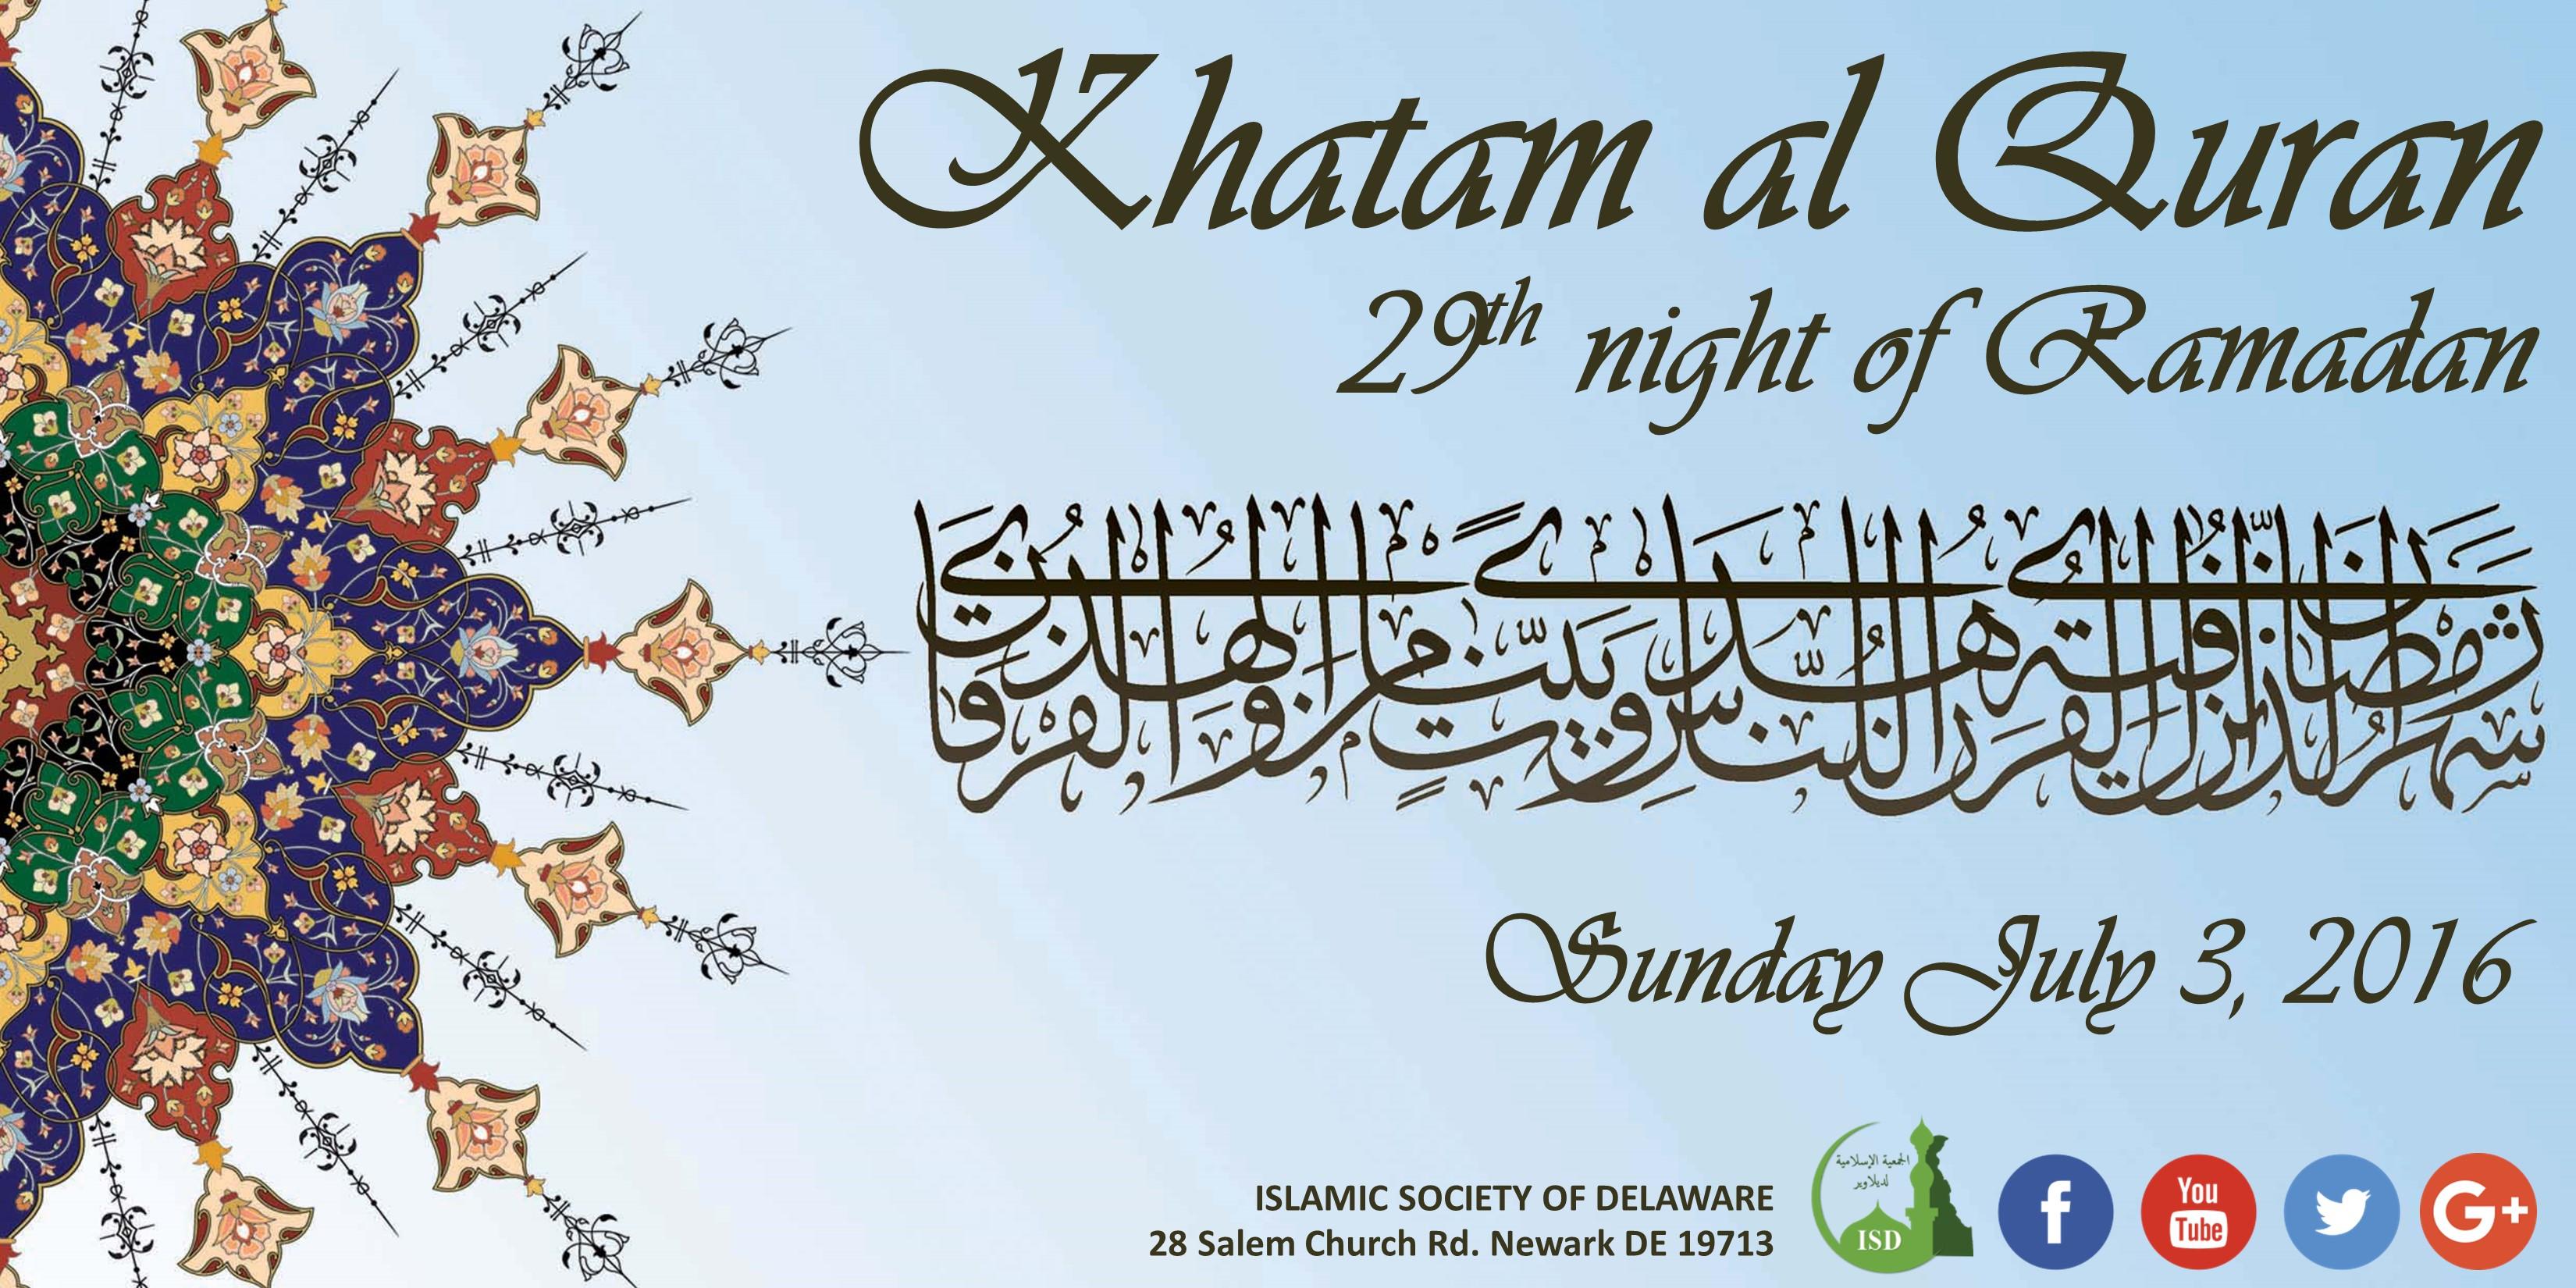 Khatam Al Quraan